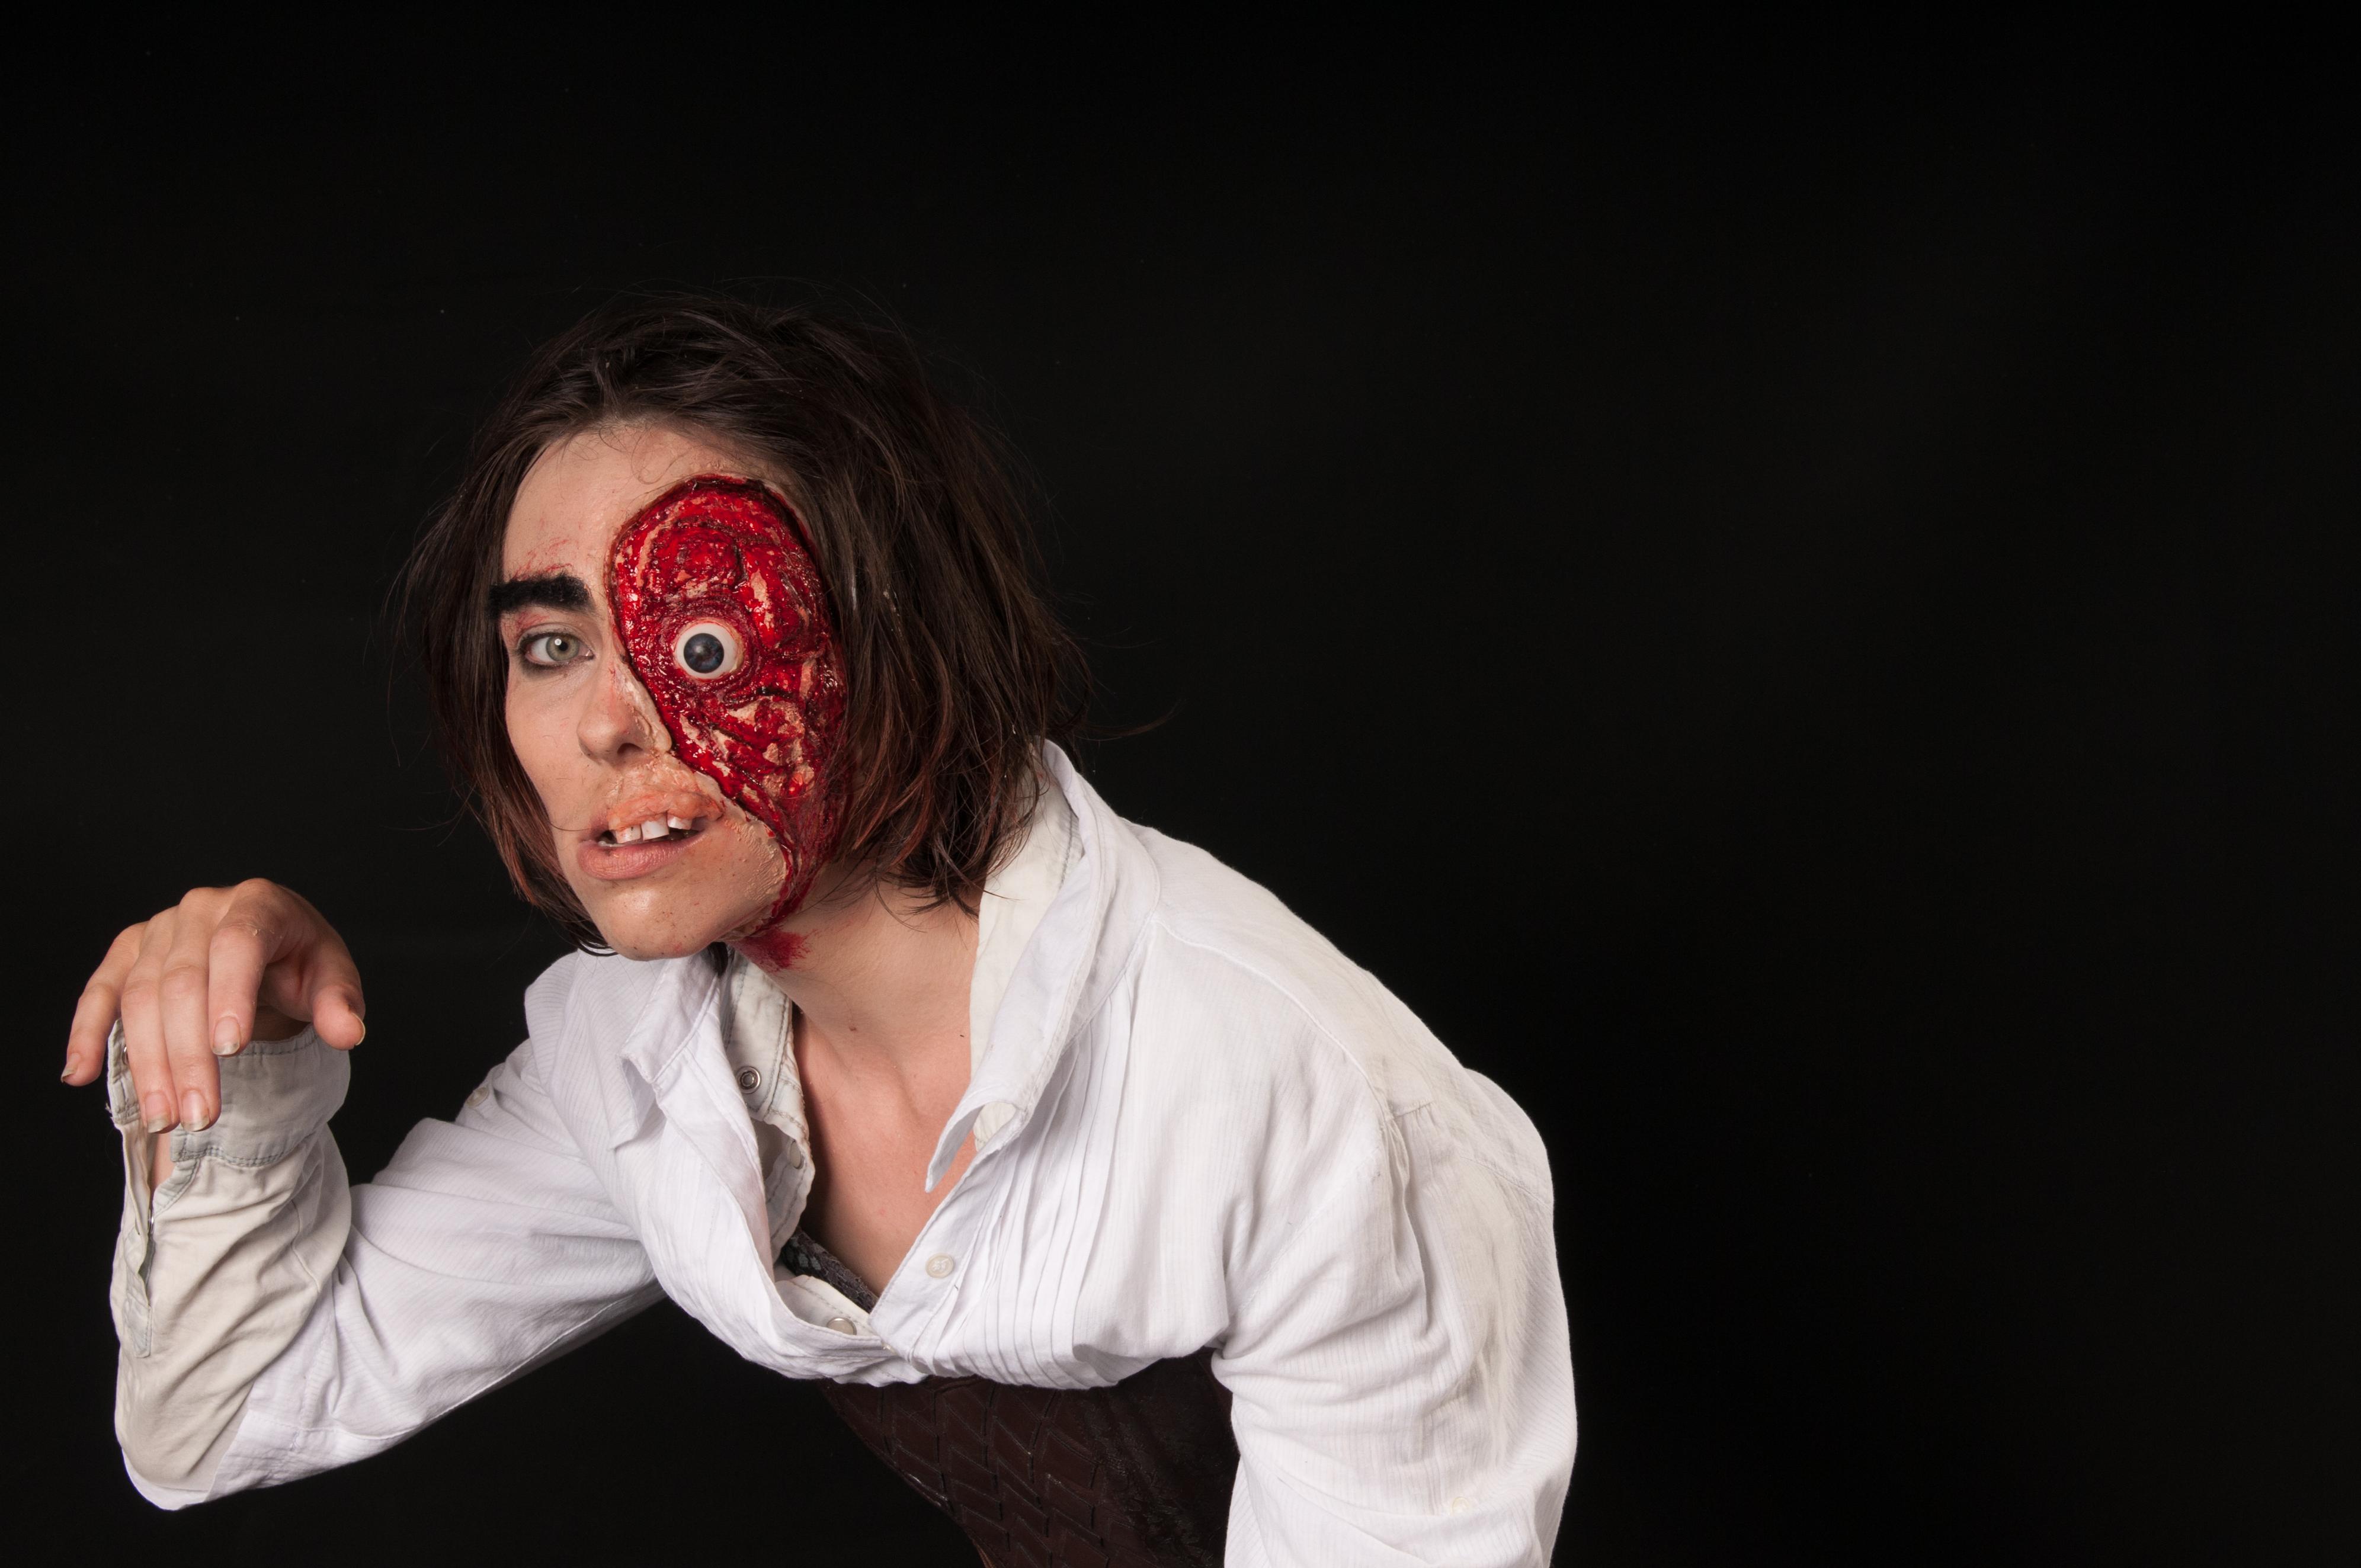 Zombie/disfigured person